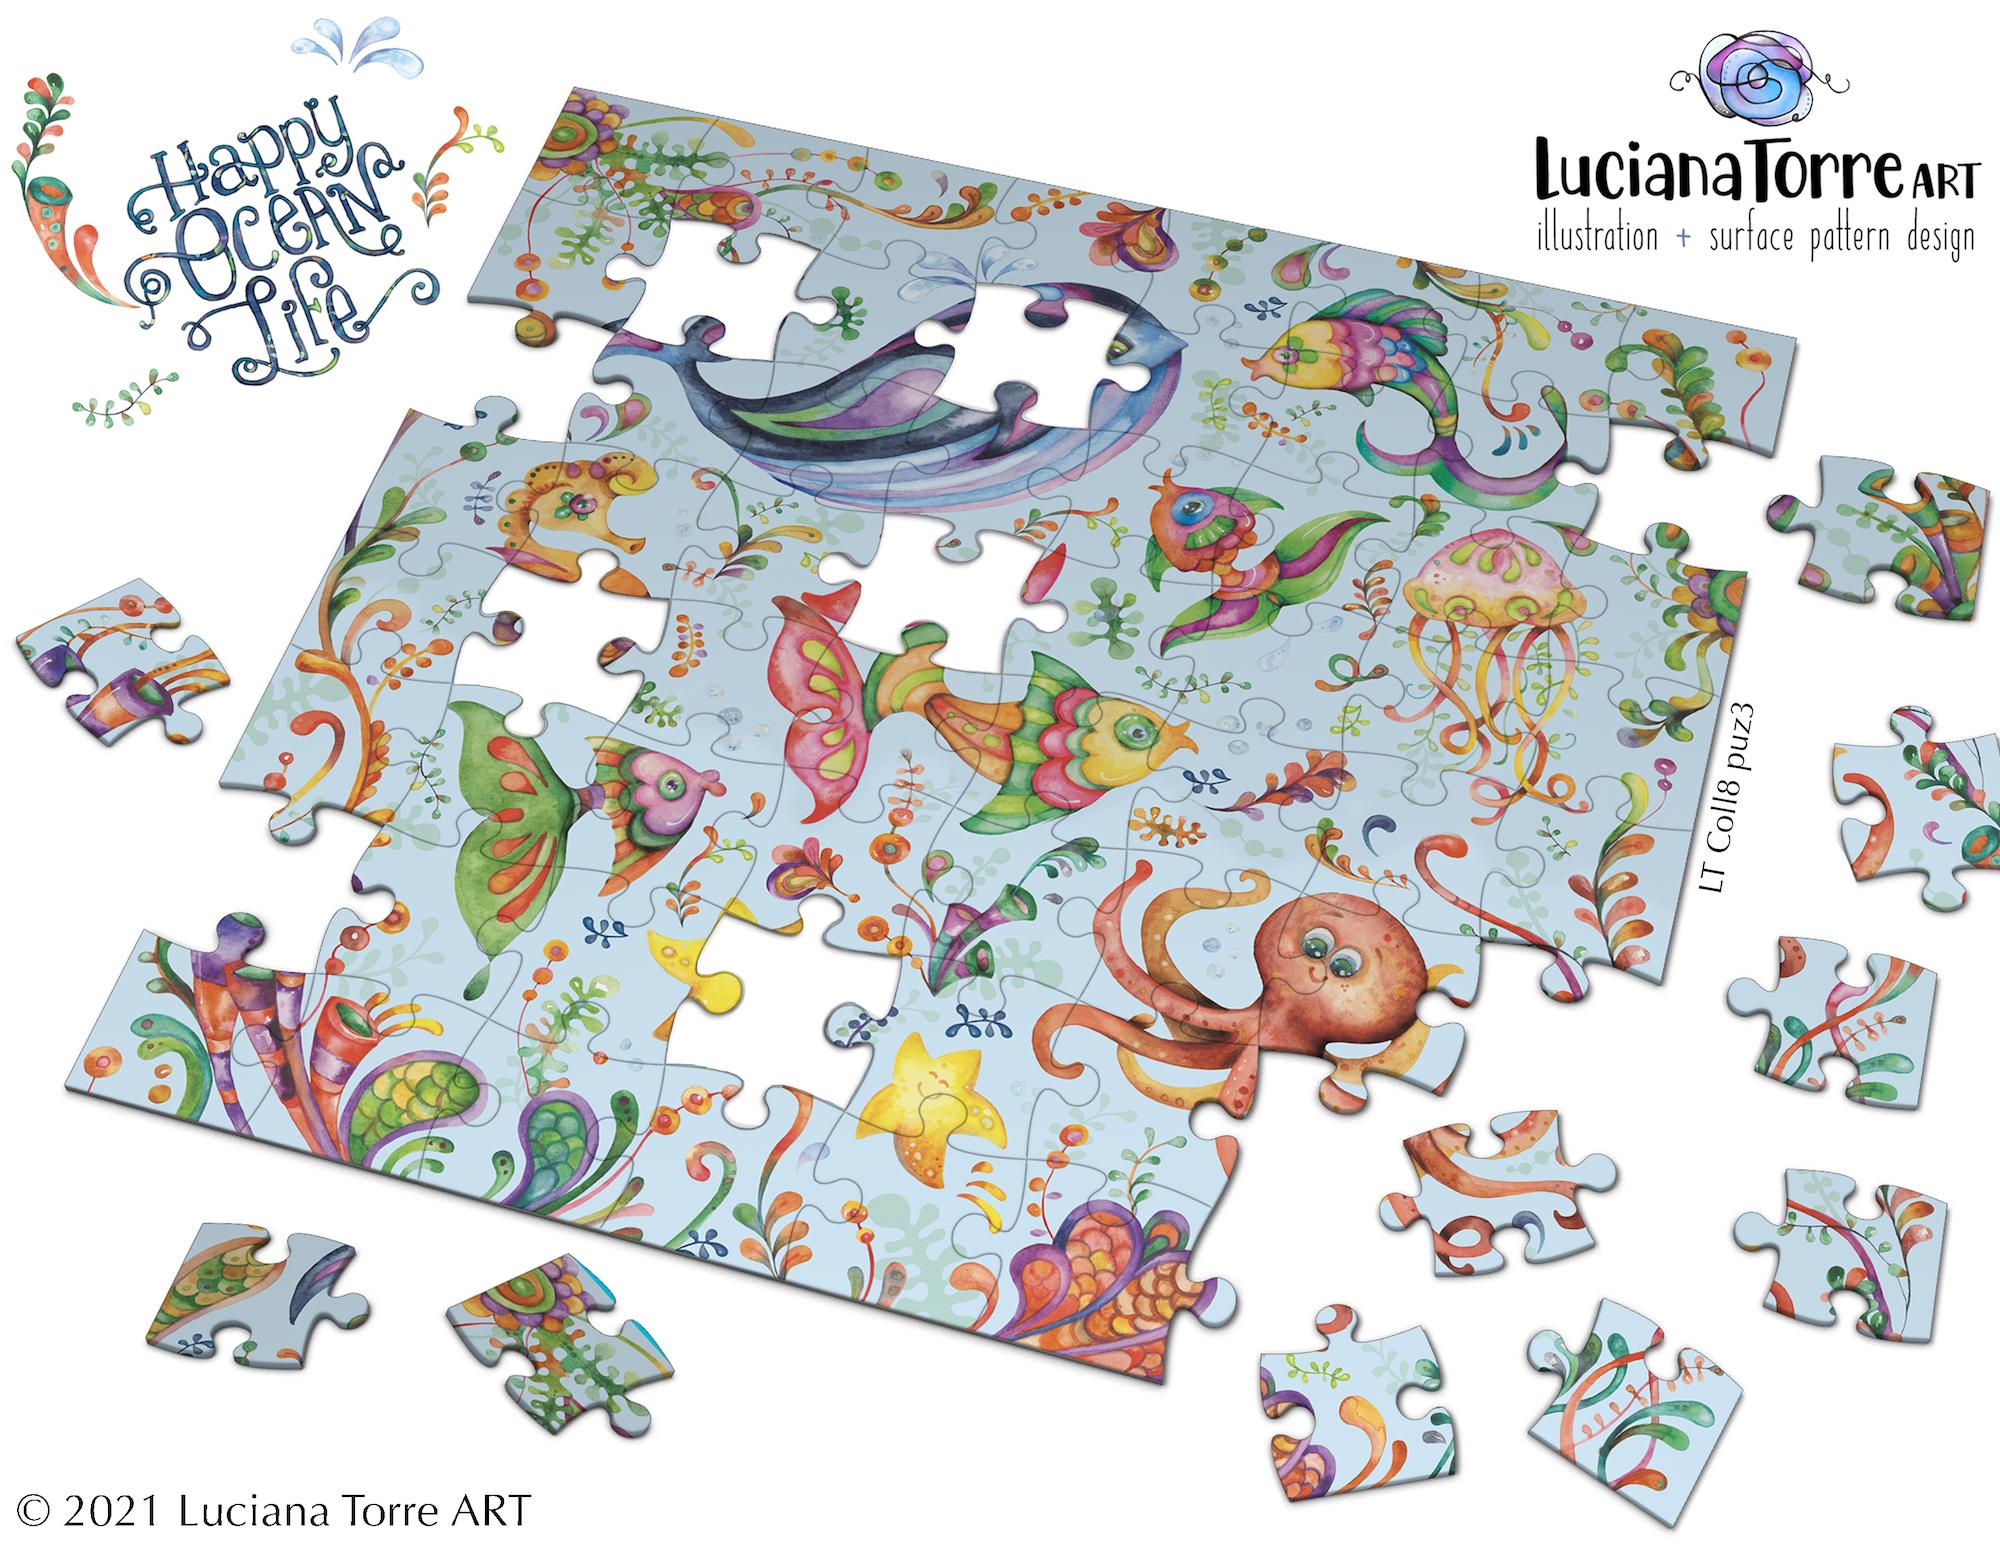 Luciana Torre Art puzzle illustration